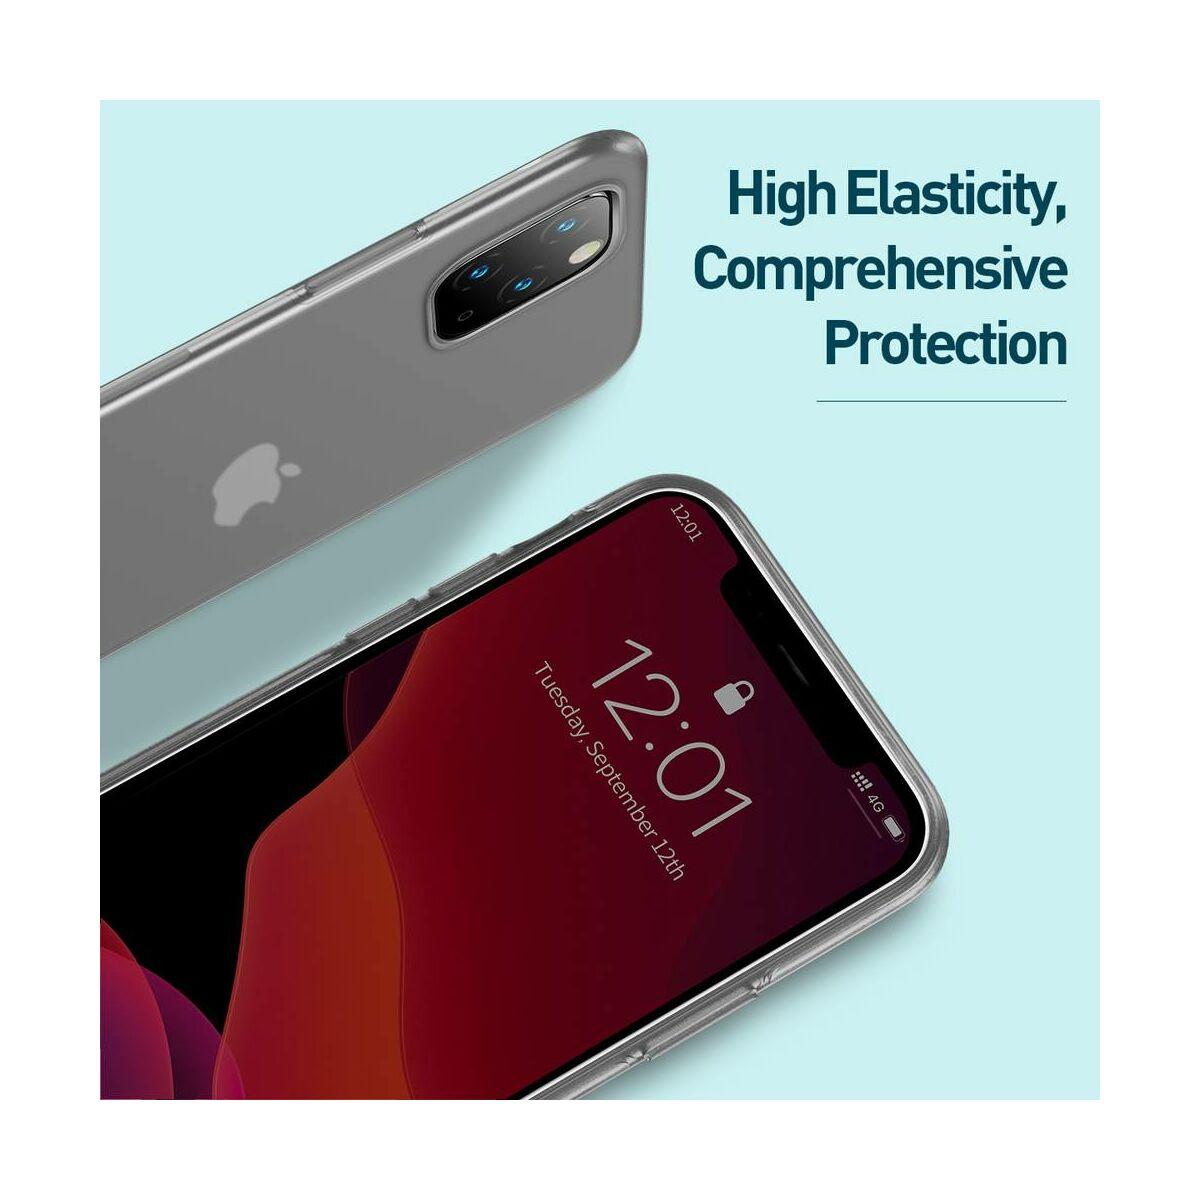 Baseus iPhone 11 Pro tok, Jelly Liquid Silica Gel Protective tok, átlátszó fekete (WIAPIPH58S-GD01